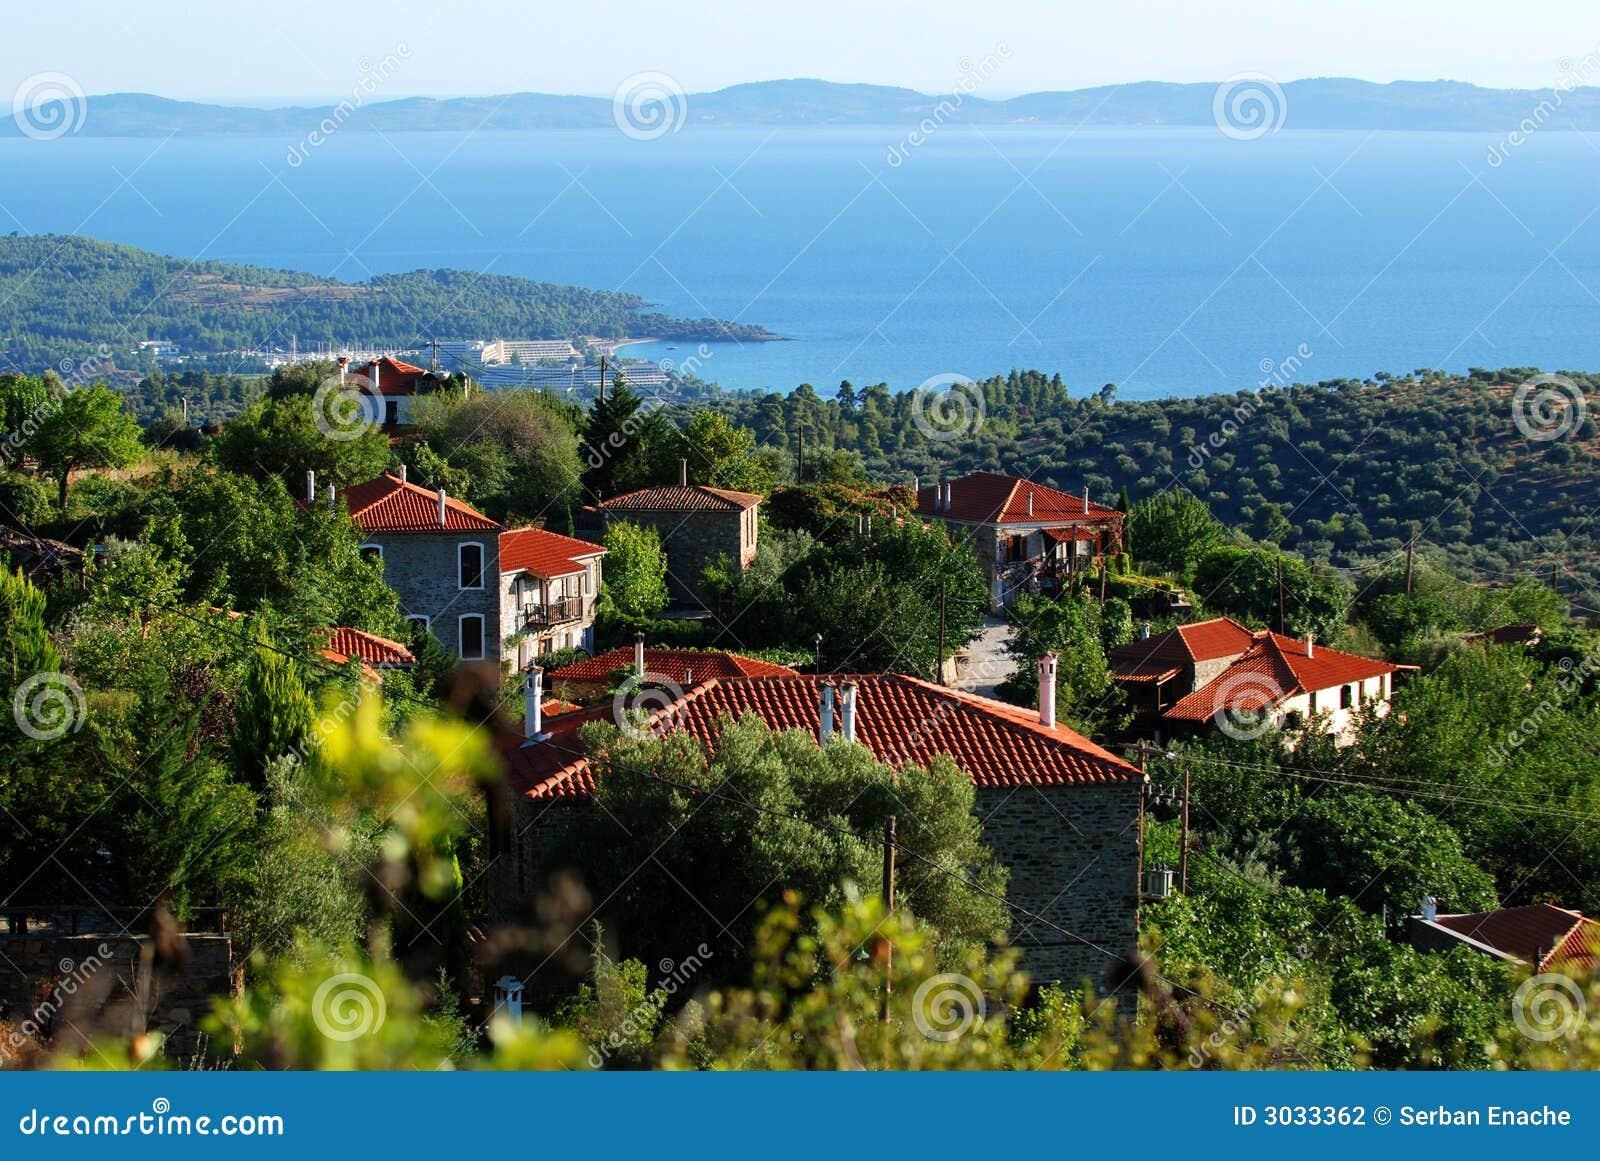 Greece by